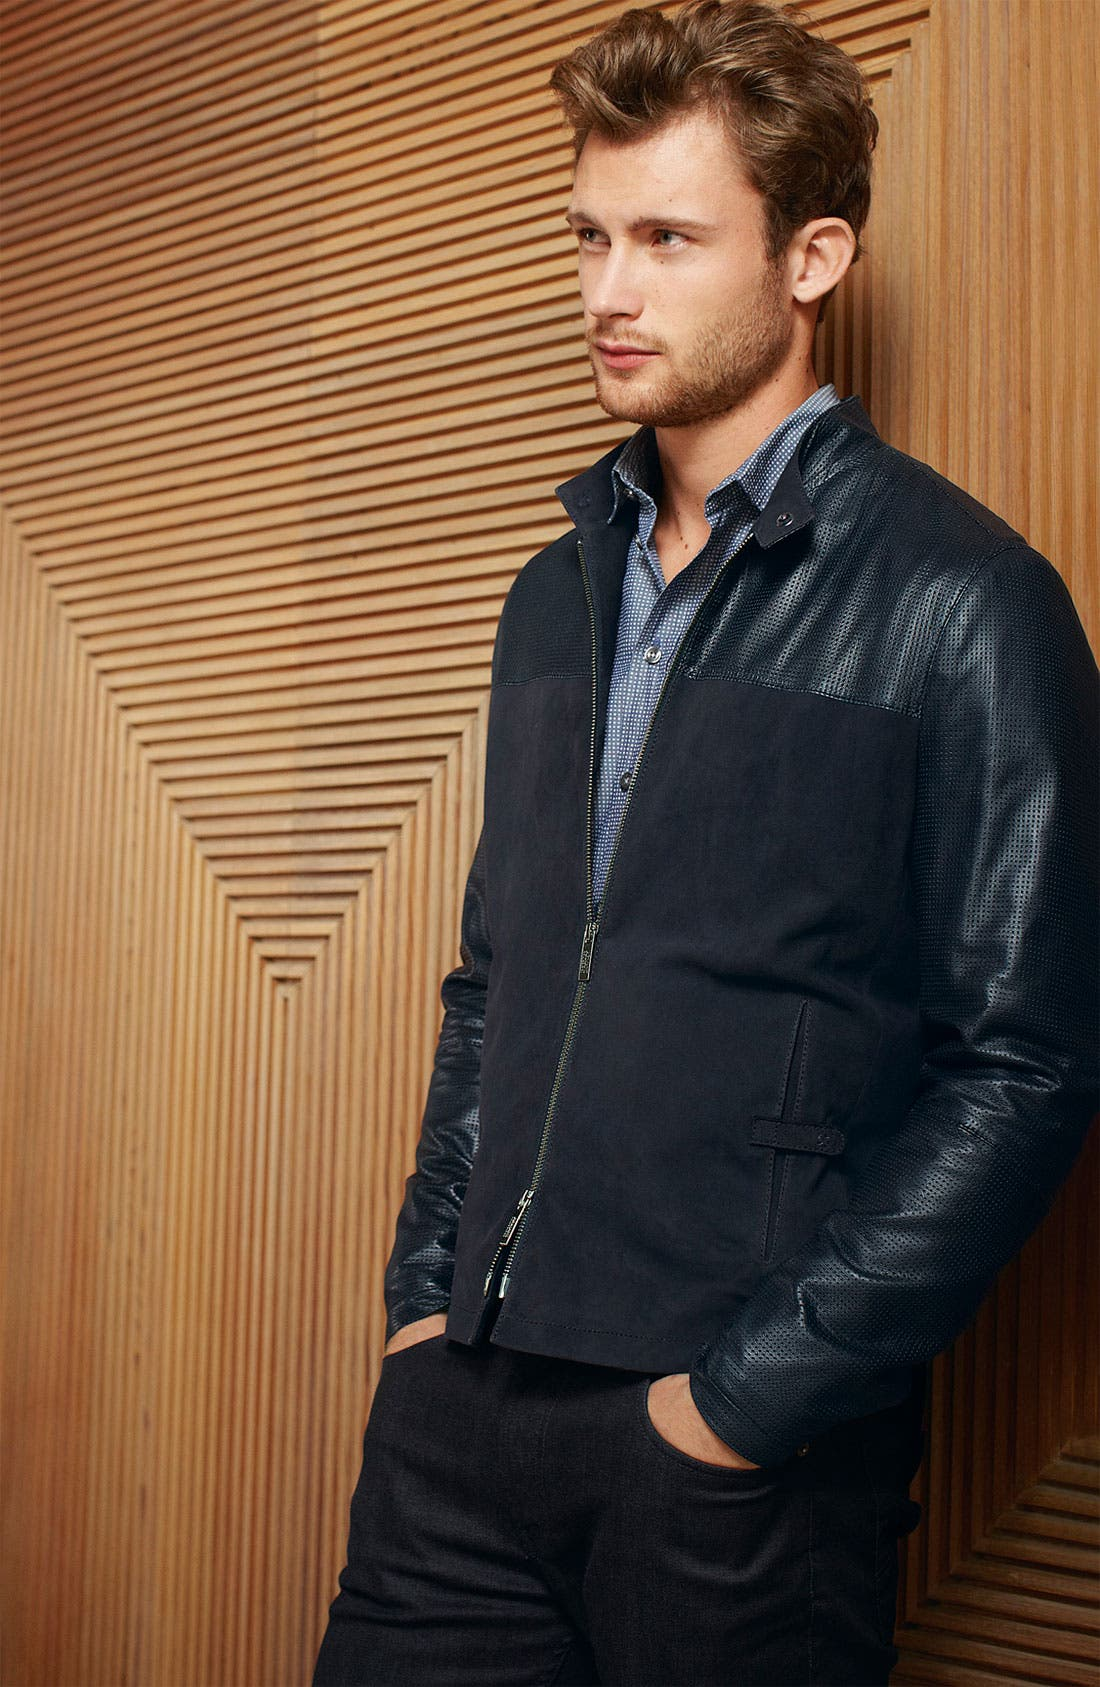 Alternate Image 1 Selected - Armani Collezioni Jacket, Sport Shirt & Jeans